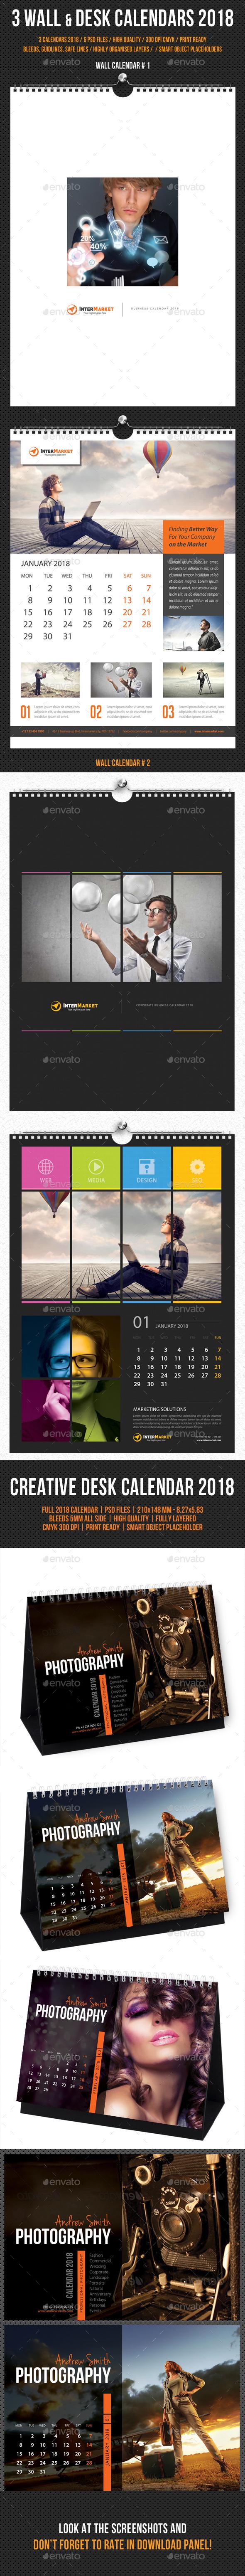 Wall and Desk Calendar 2018 Bundle - Calendars Stationery